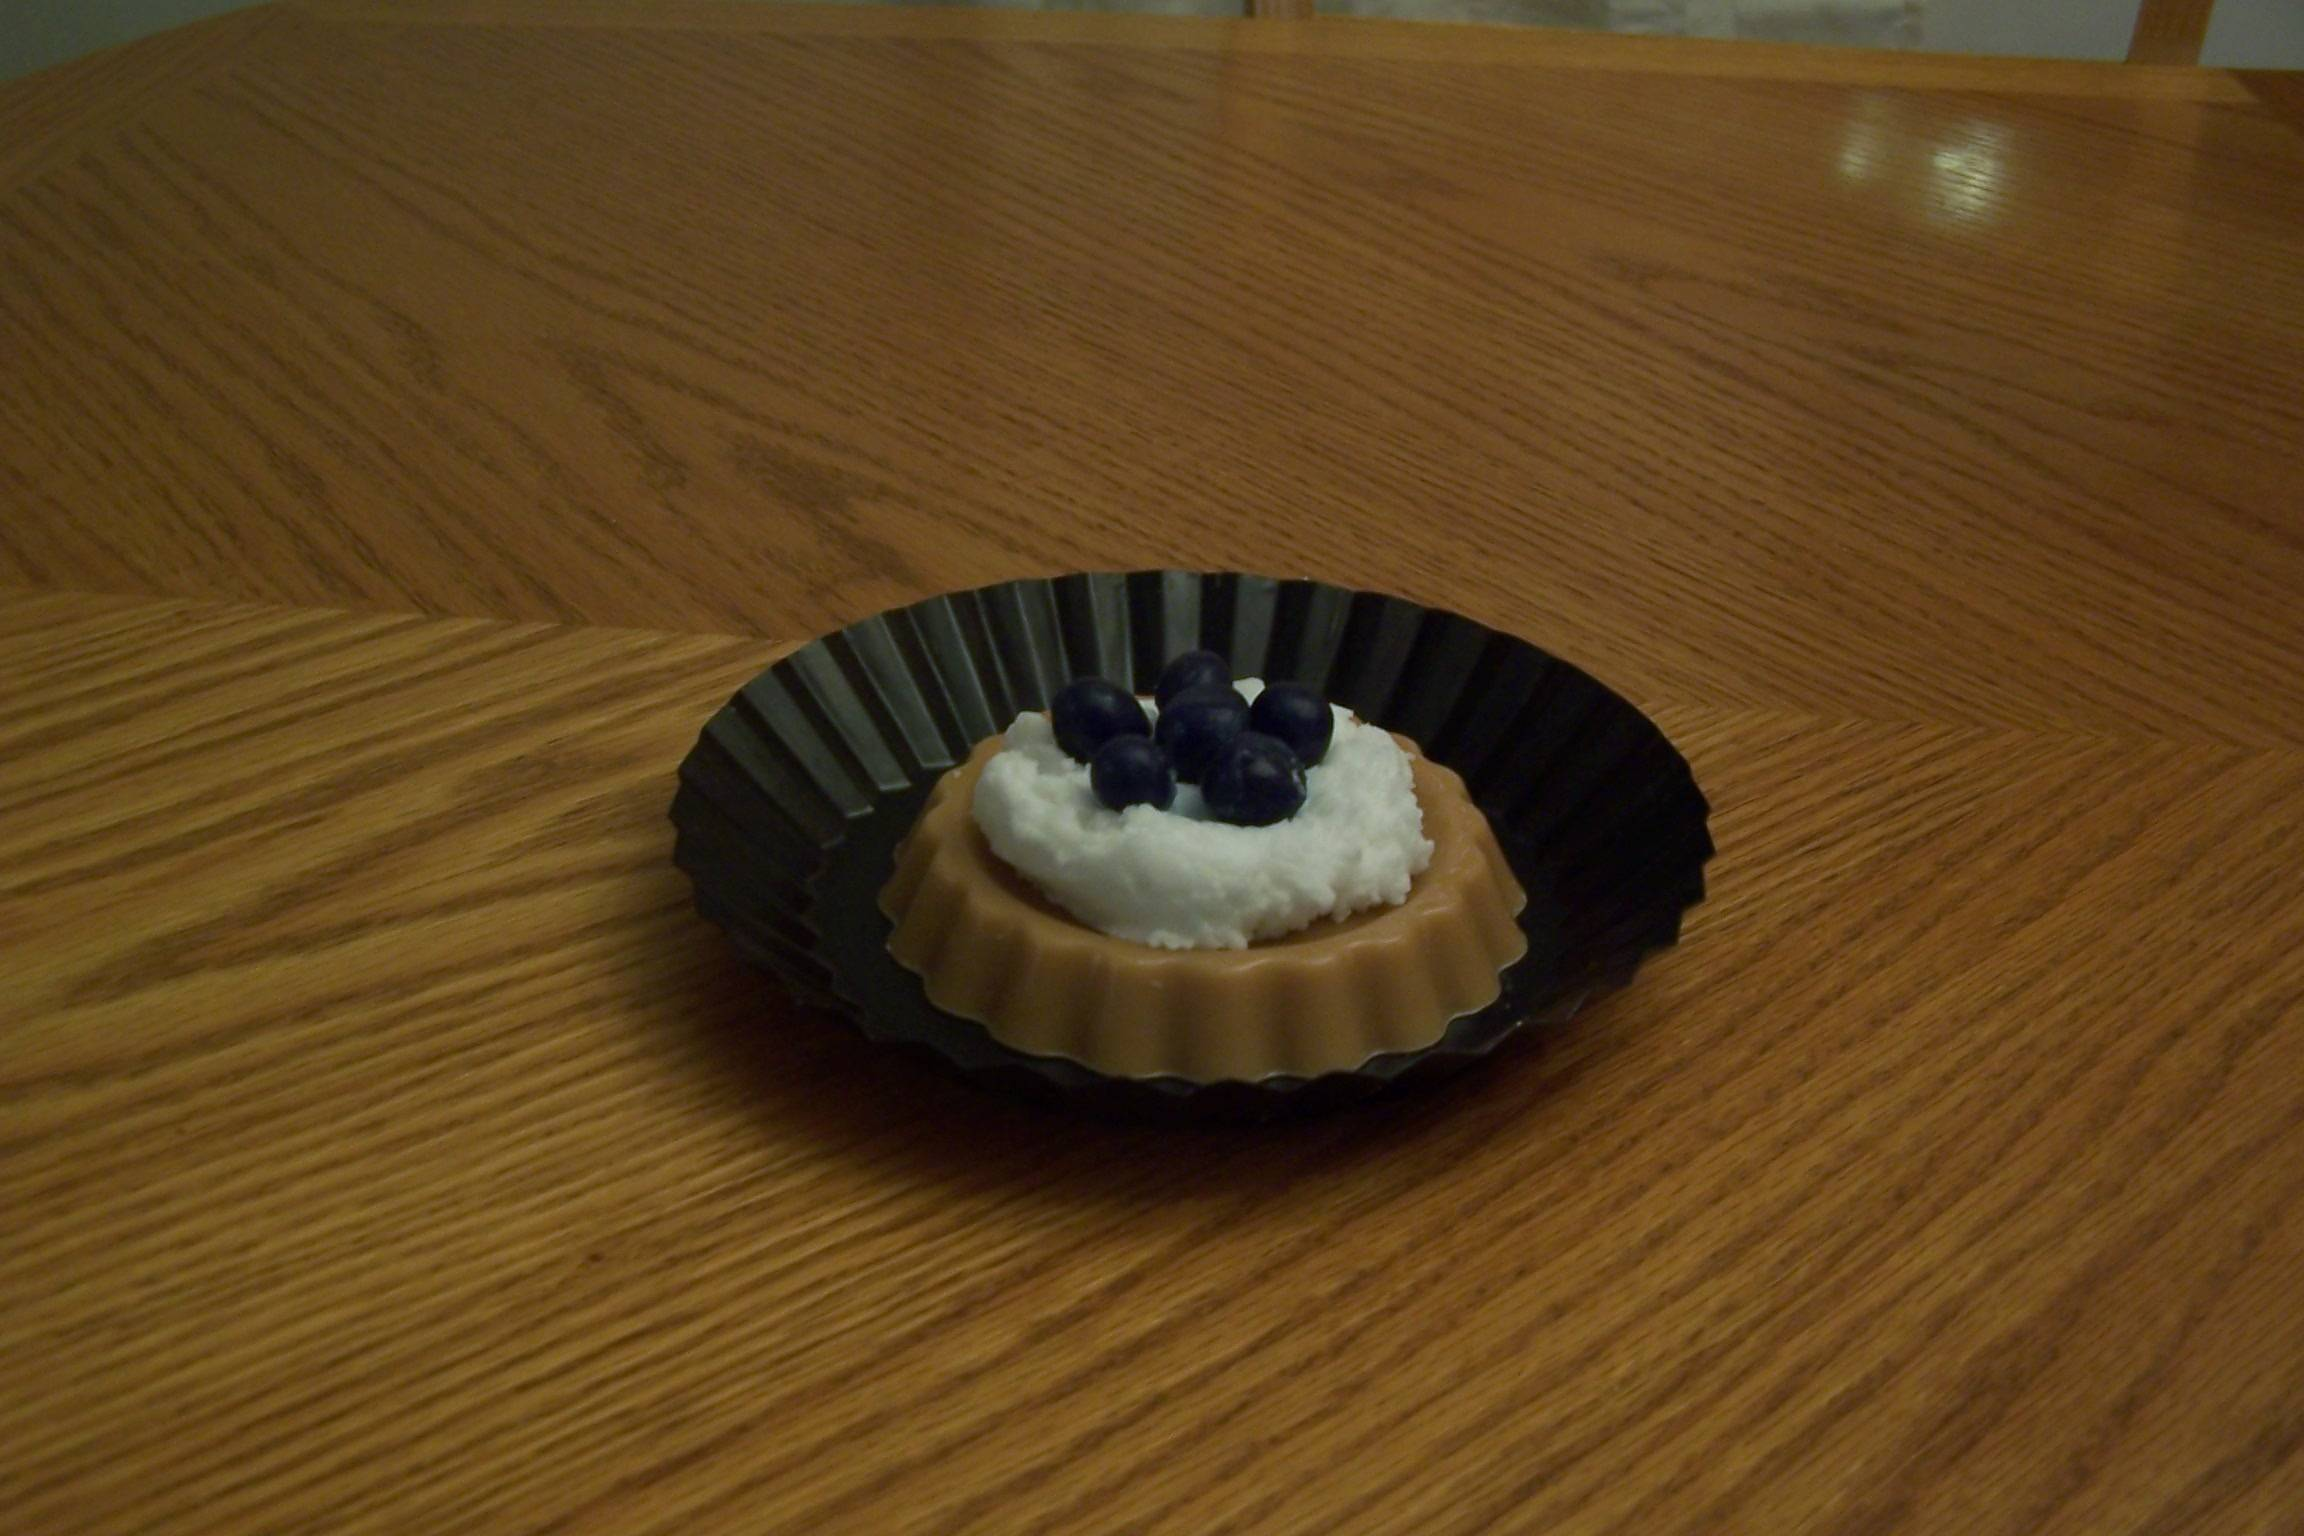 1 Lg. Blueberry Tart Wax Melt